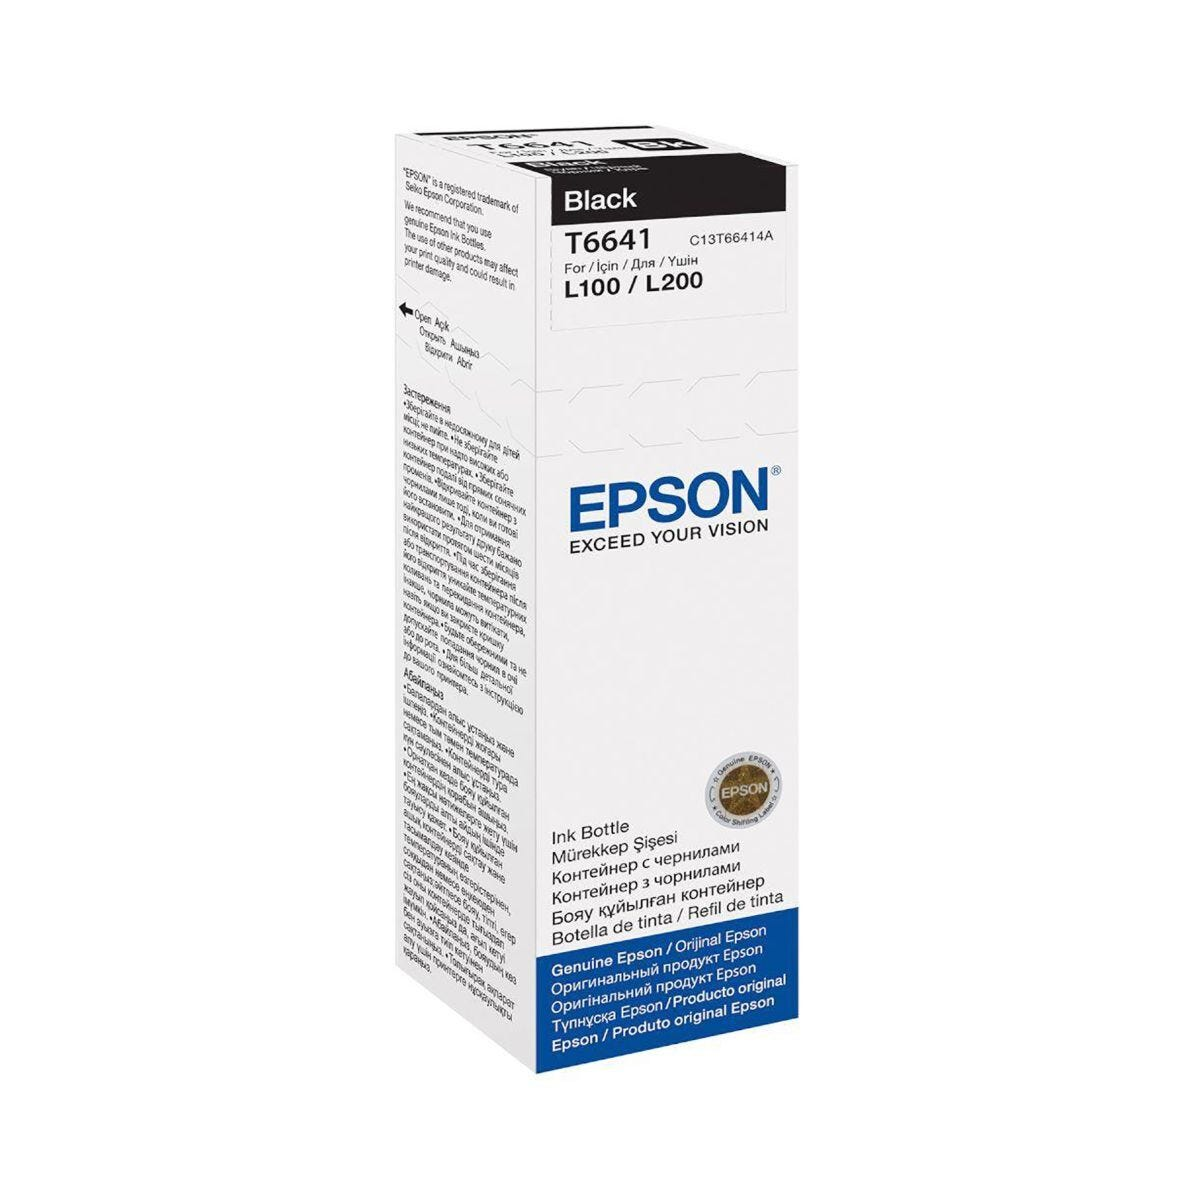 Epson EcoTank Ink Bottle T6641 Black